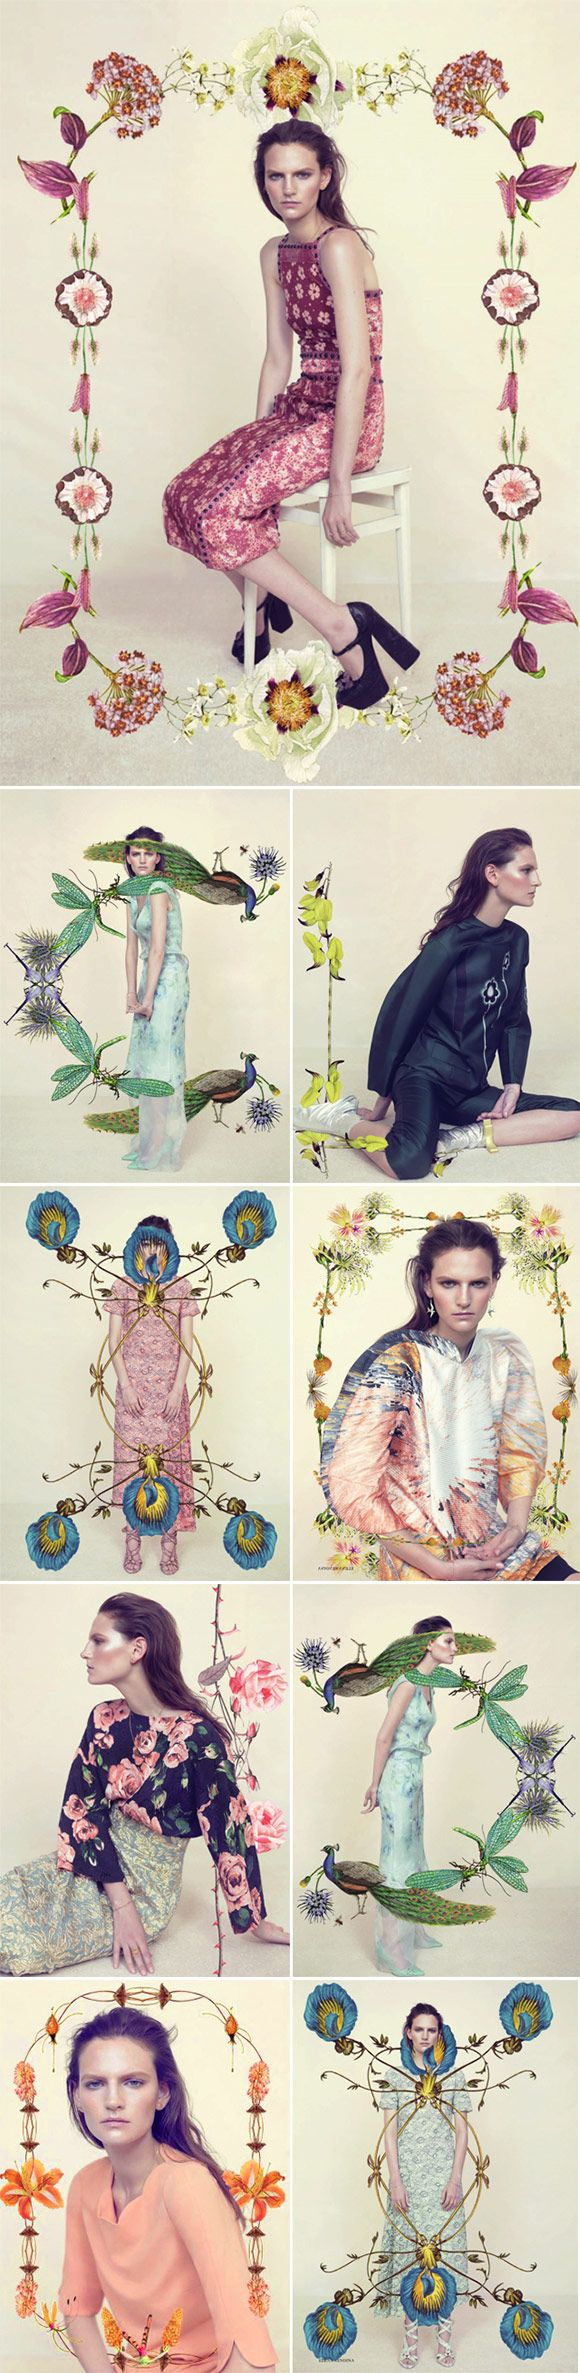 | Editorial | Floral | Primavera | Harpers Bazaar UK